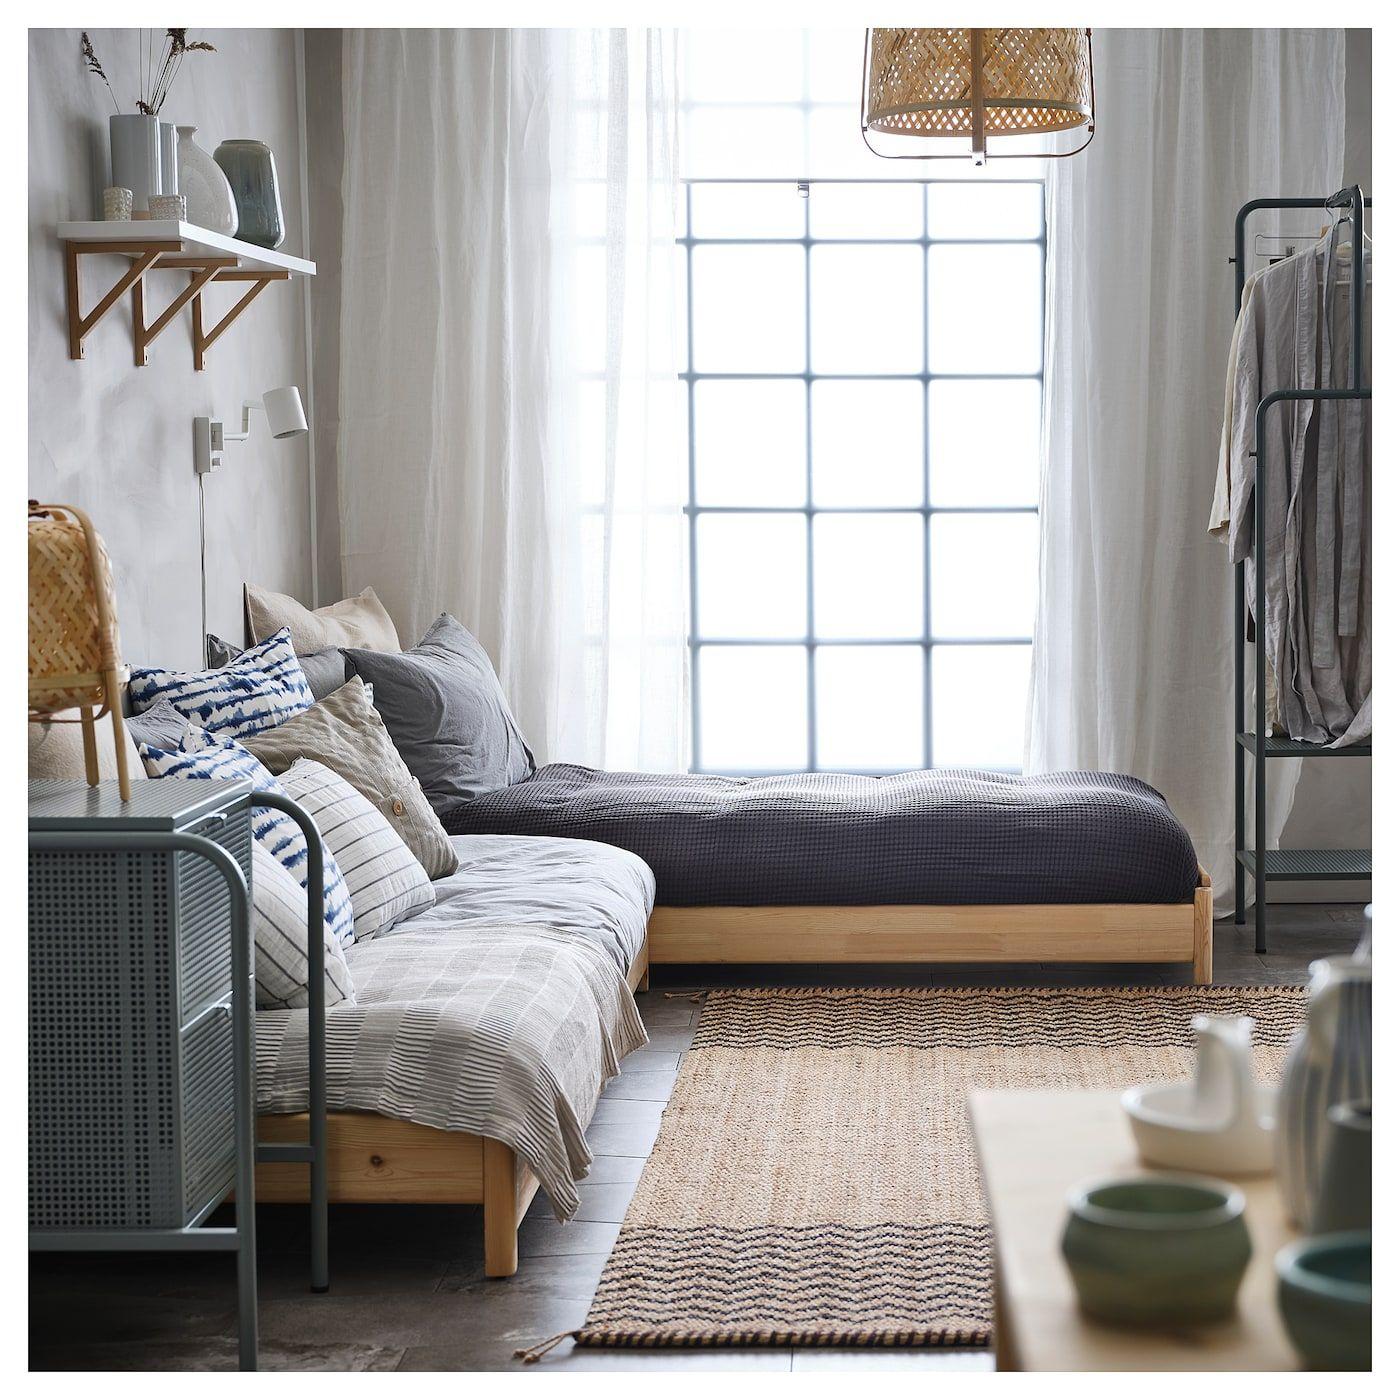 IKEA UTÅKER Stackable bed with 2 mattresses pine, Meistervik